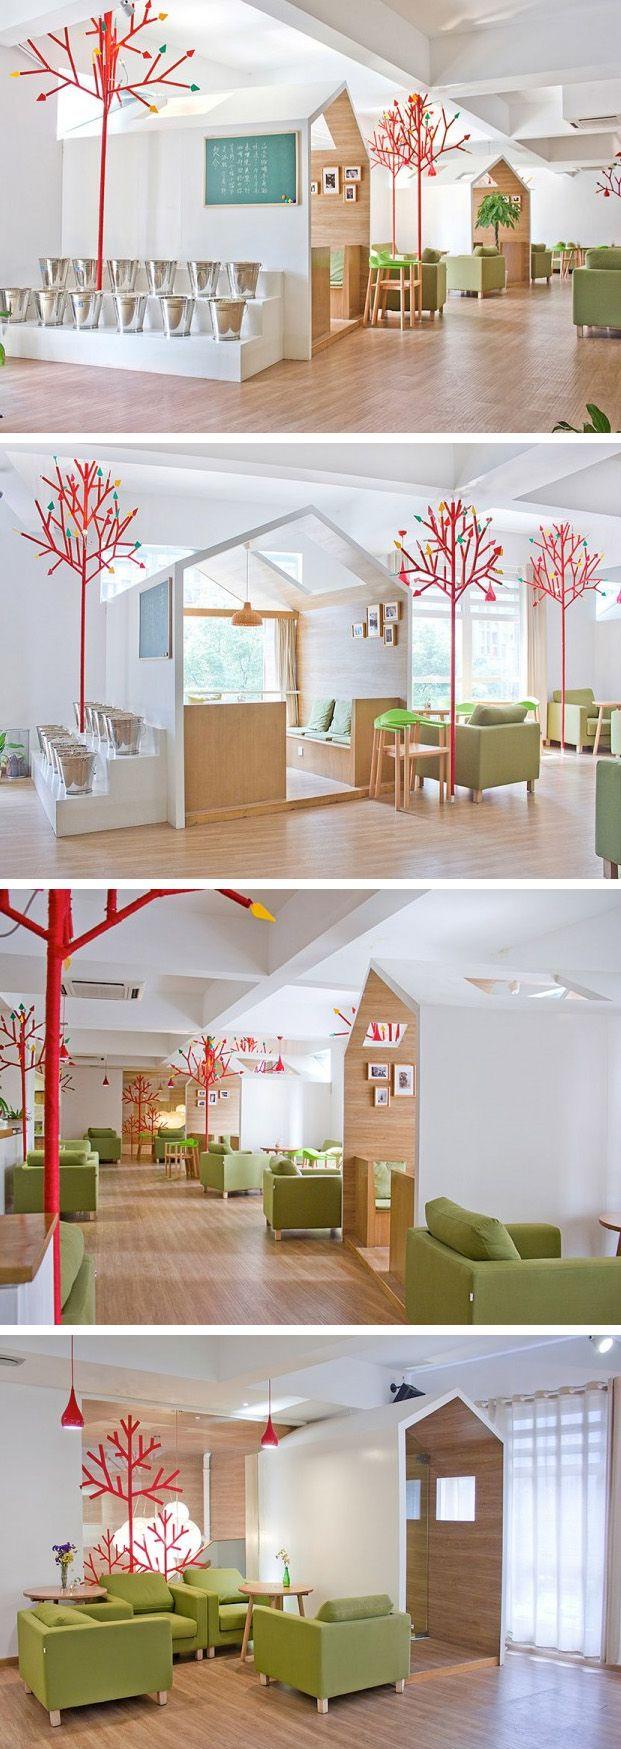 Best 25 Kids Cafe Ideas On Pinterest Play Shop Kids Grocery